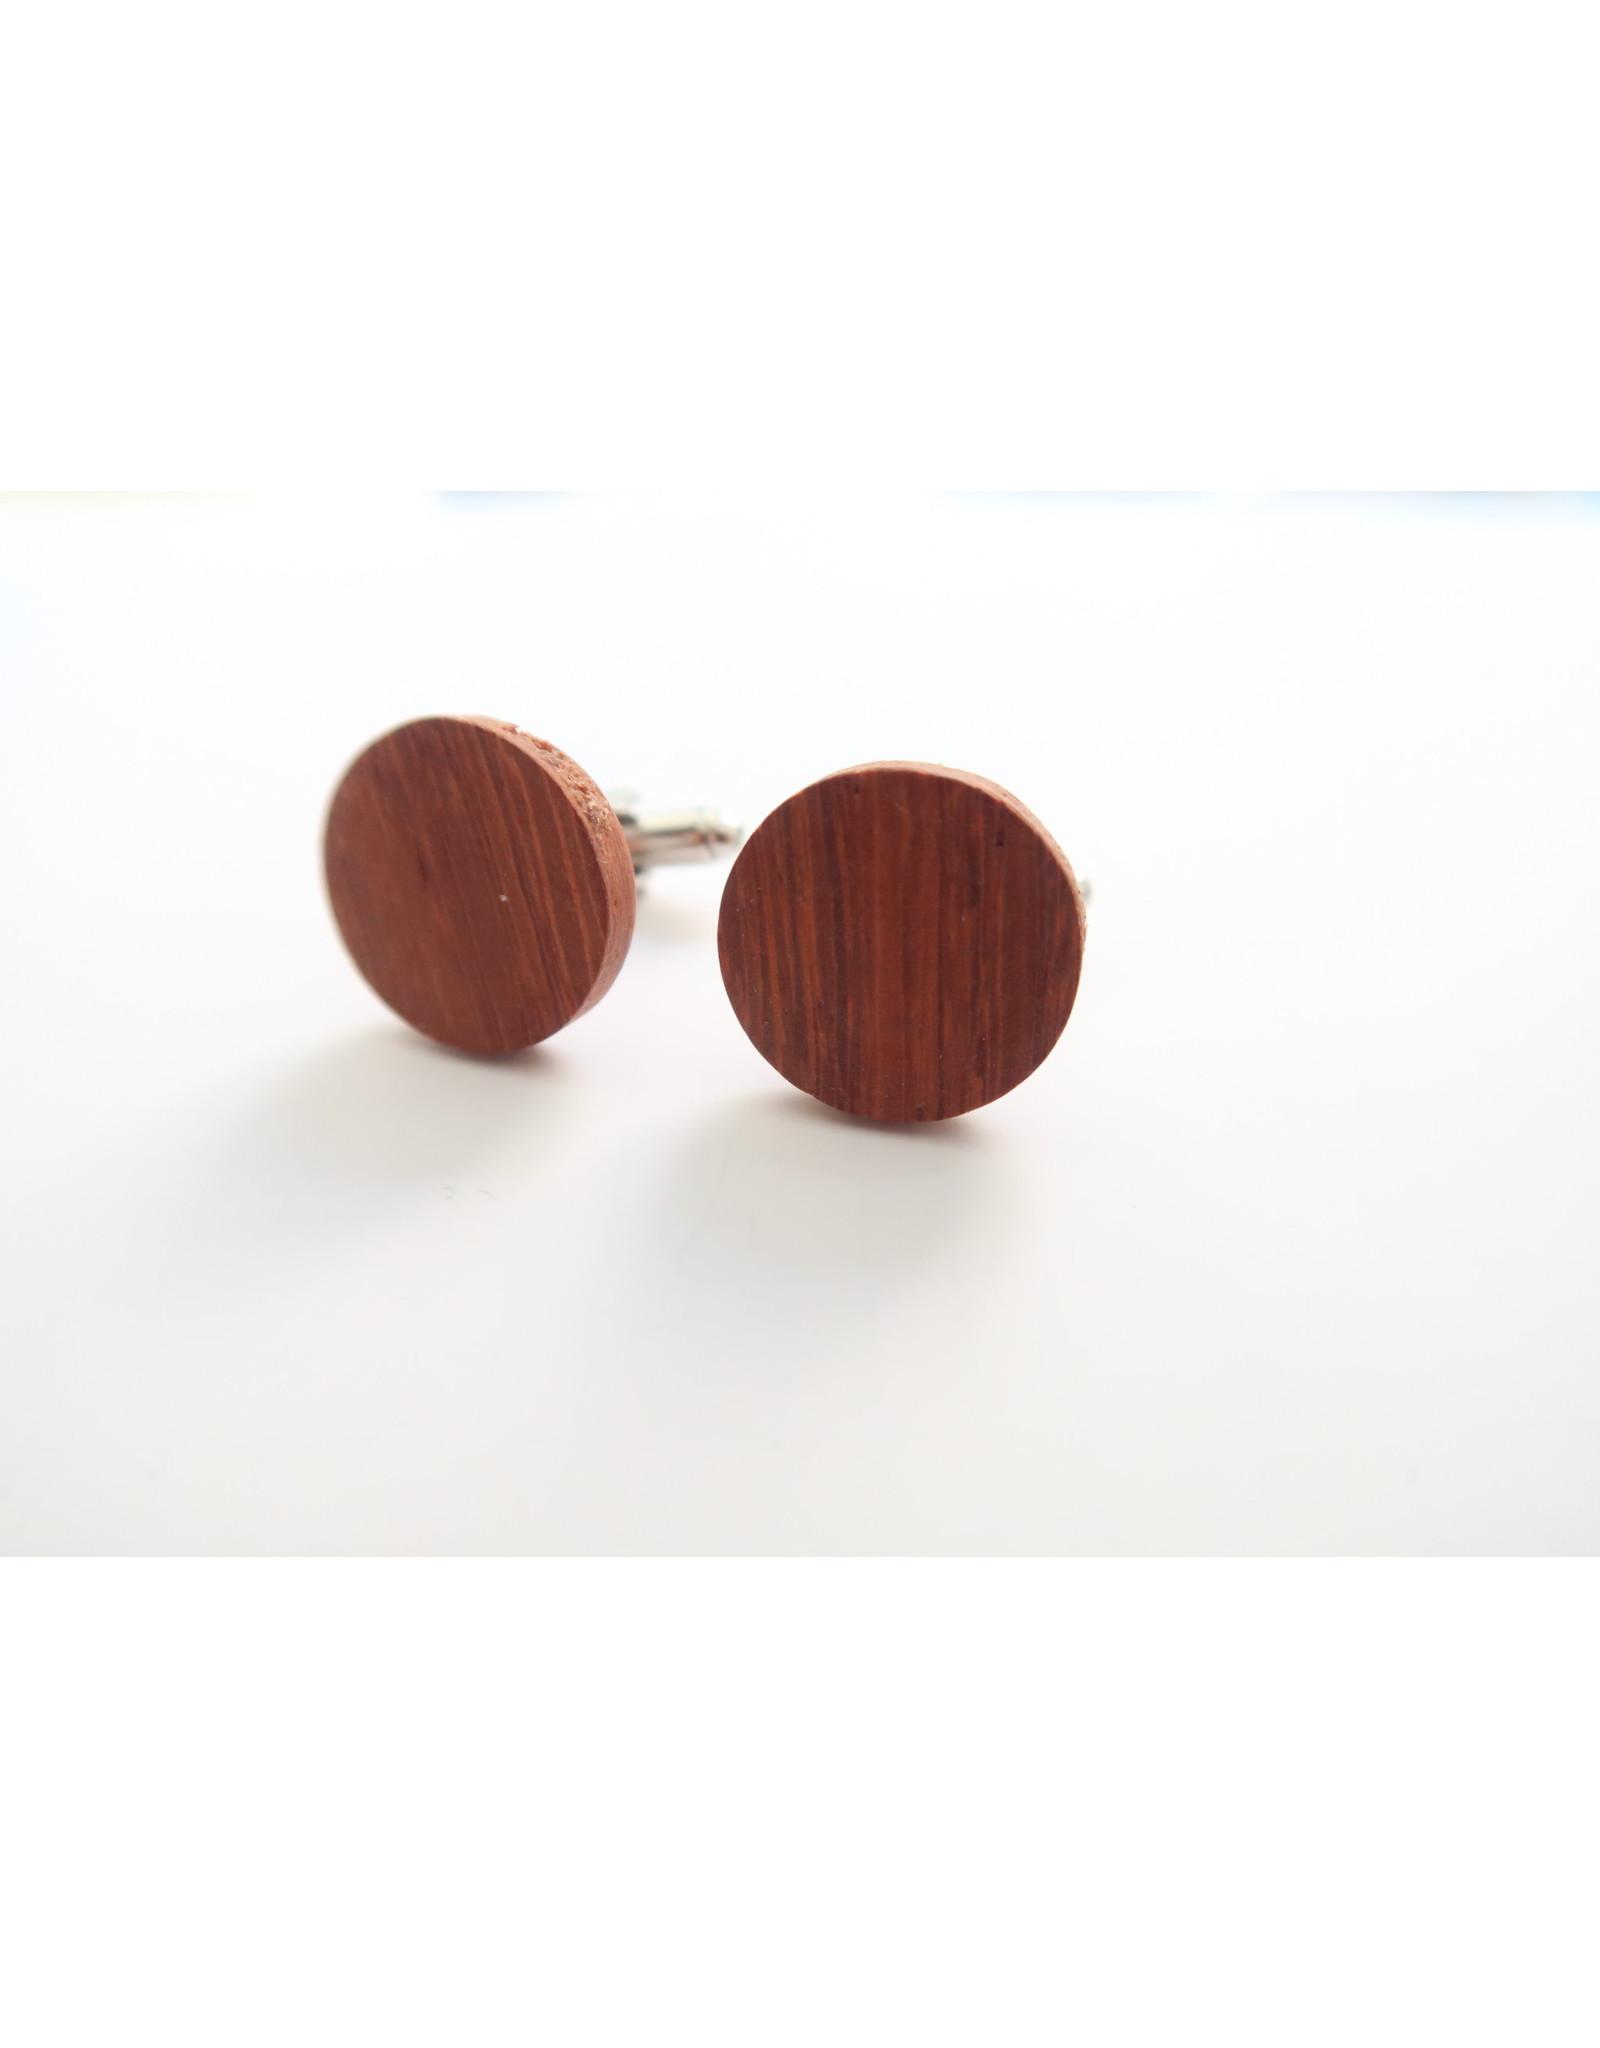 manchetknopen hout palissander